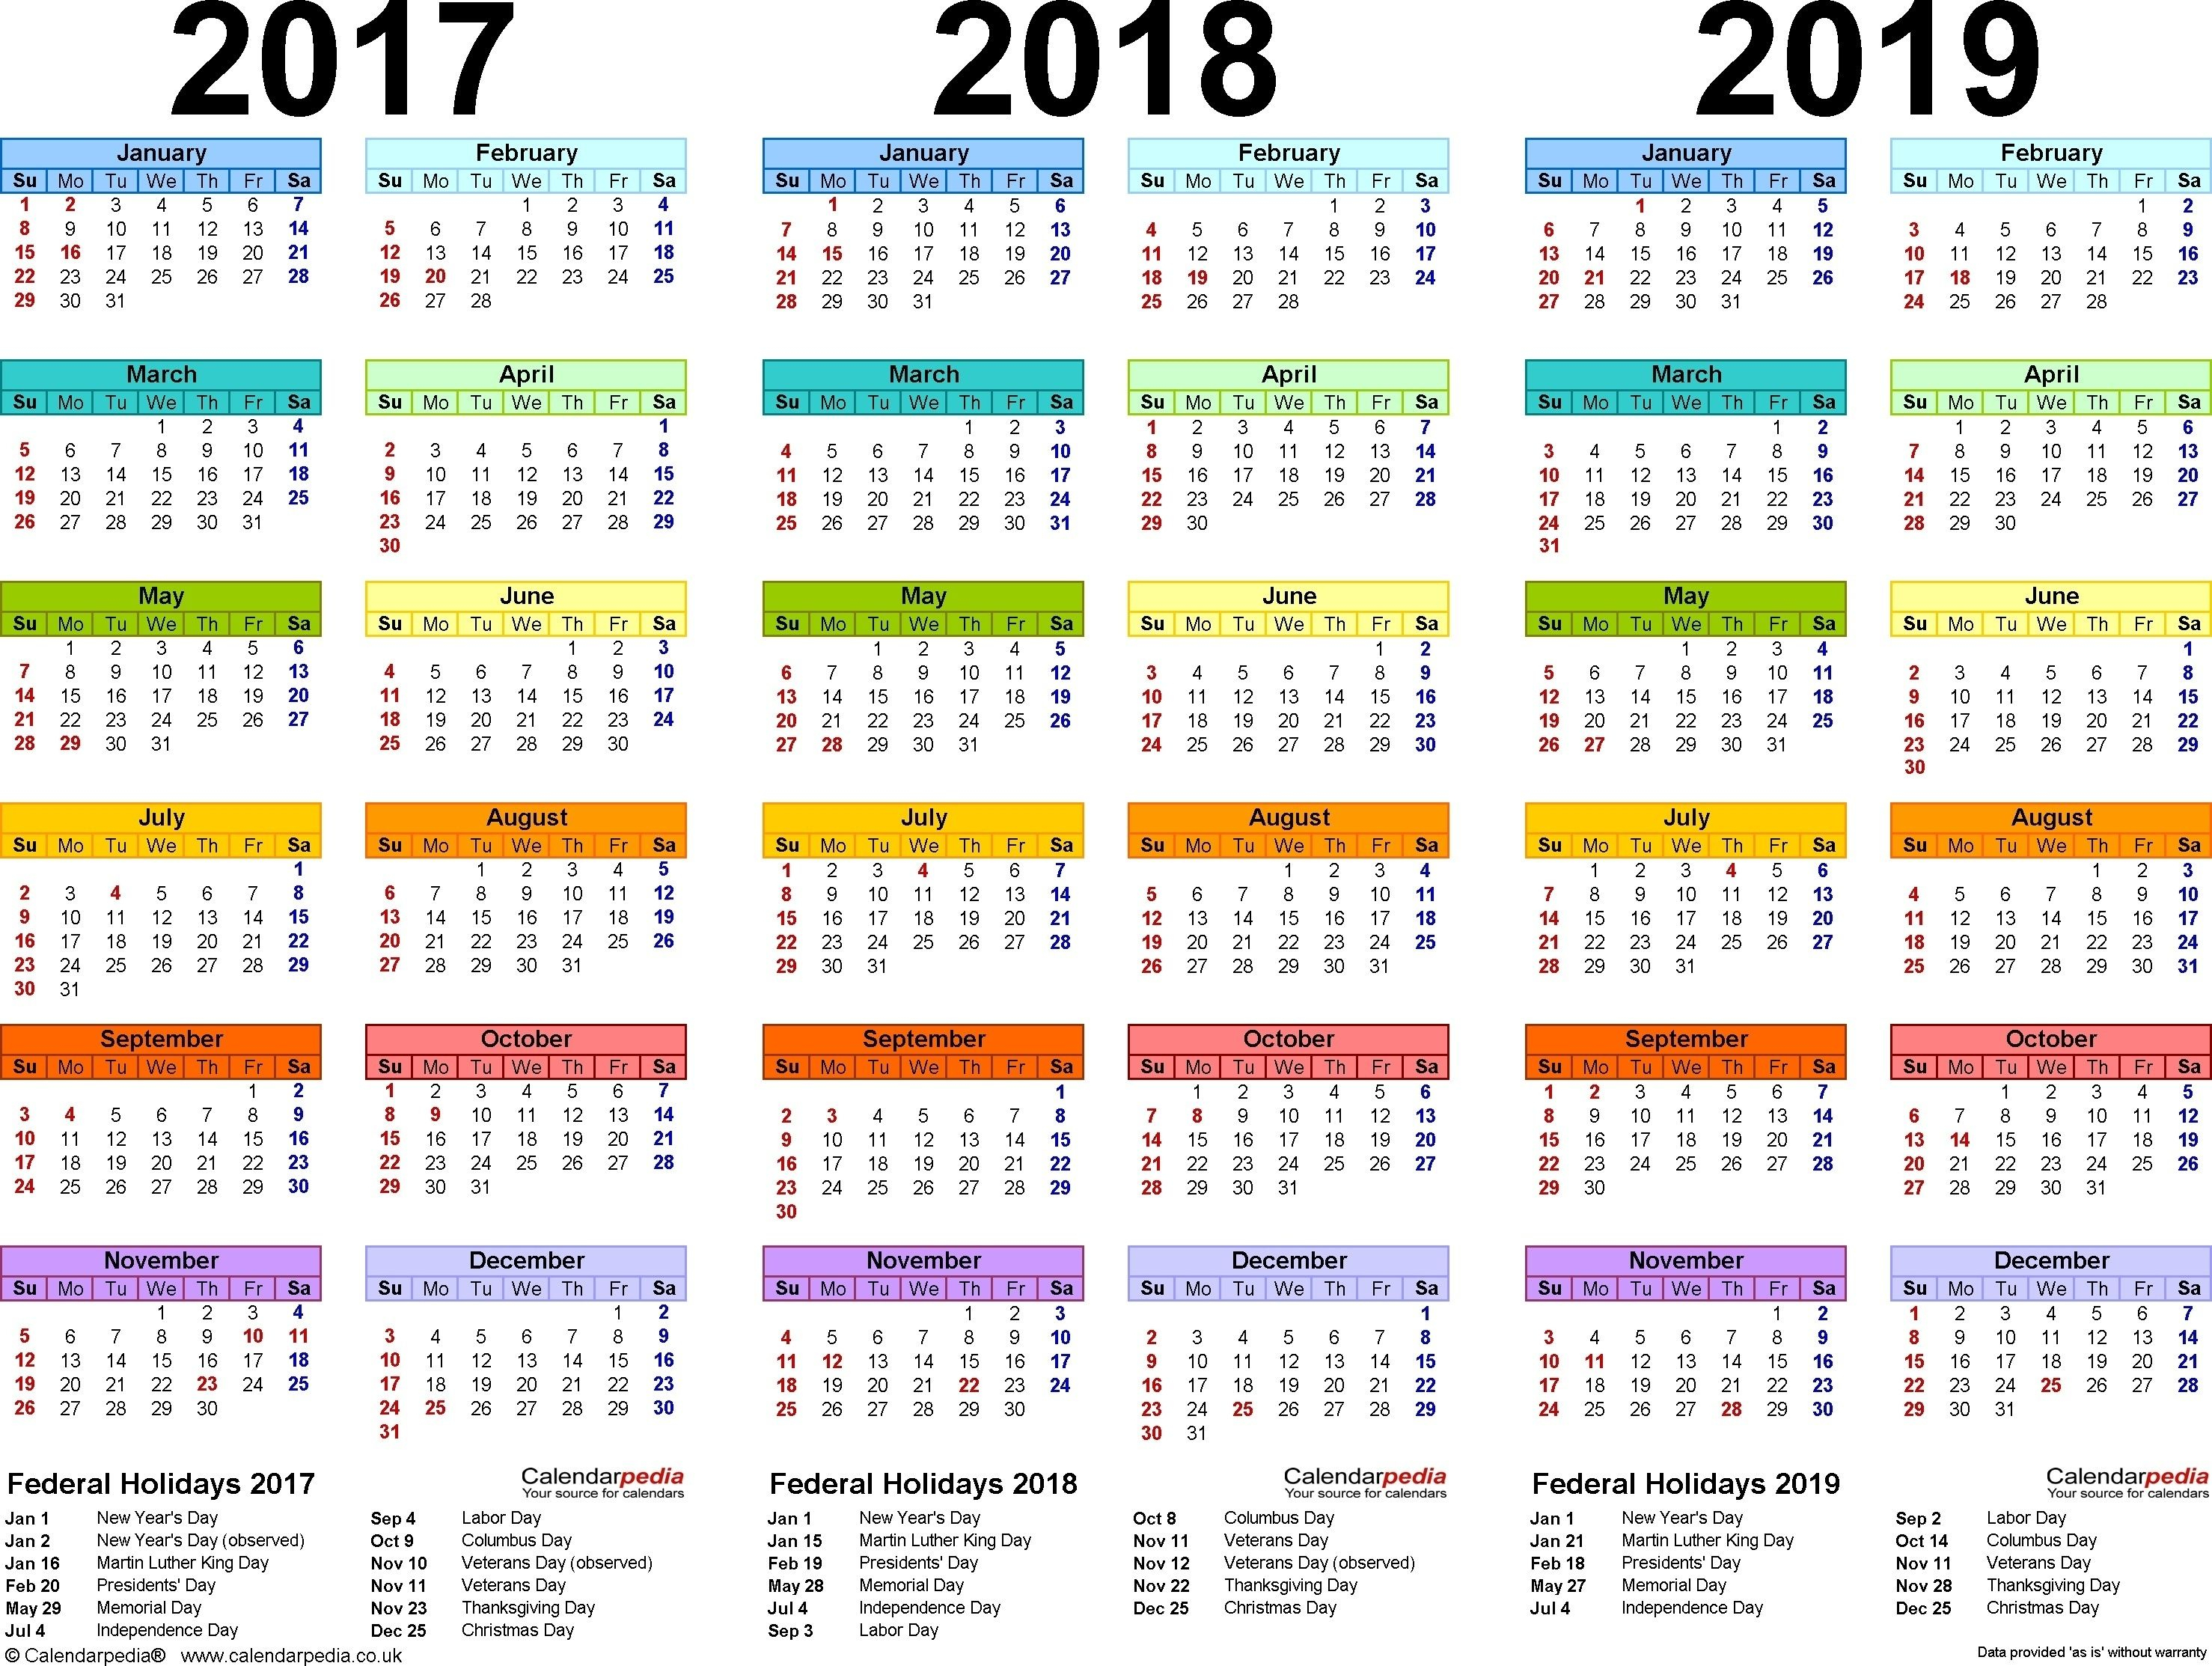 Depo Provera Perpetual Calendar 2018 – Calendar Printable within Depo-Provera Calculator